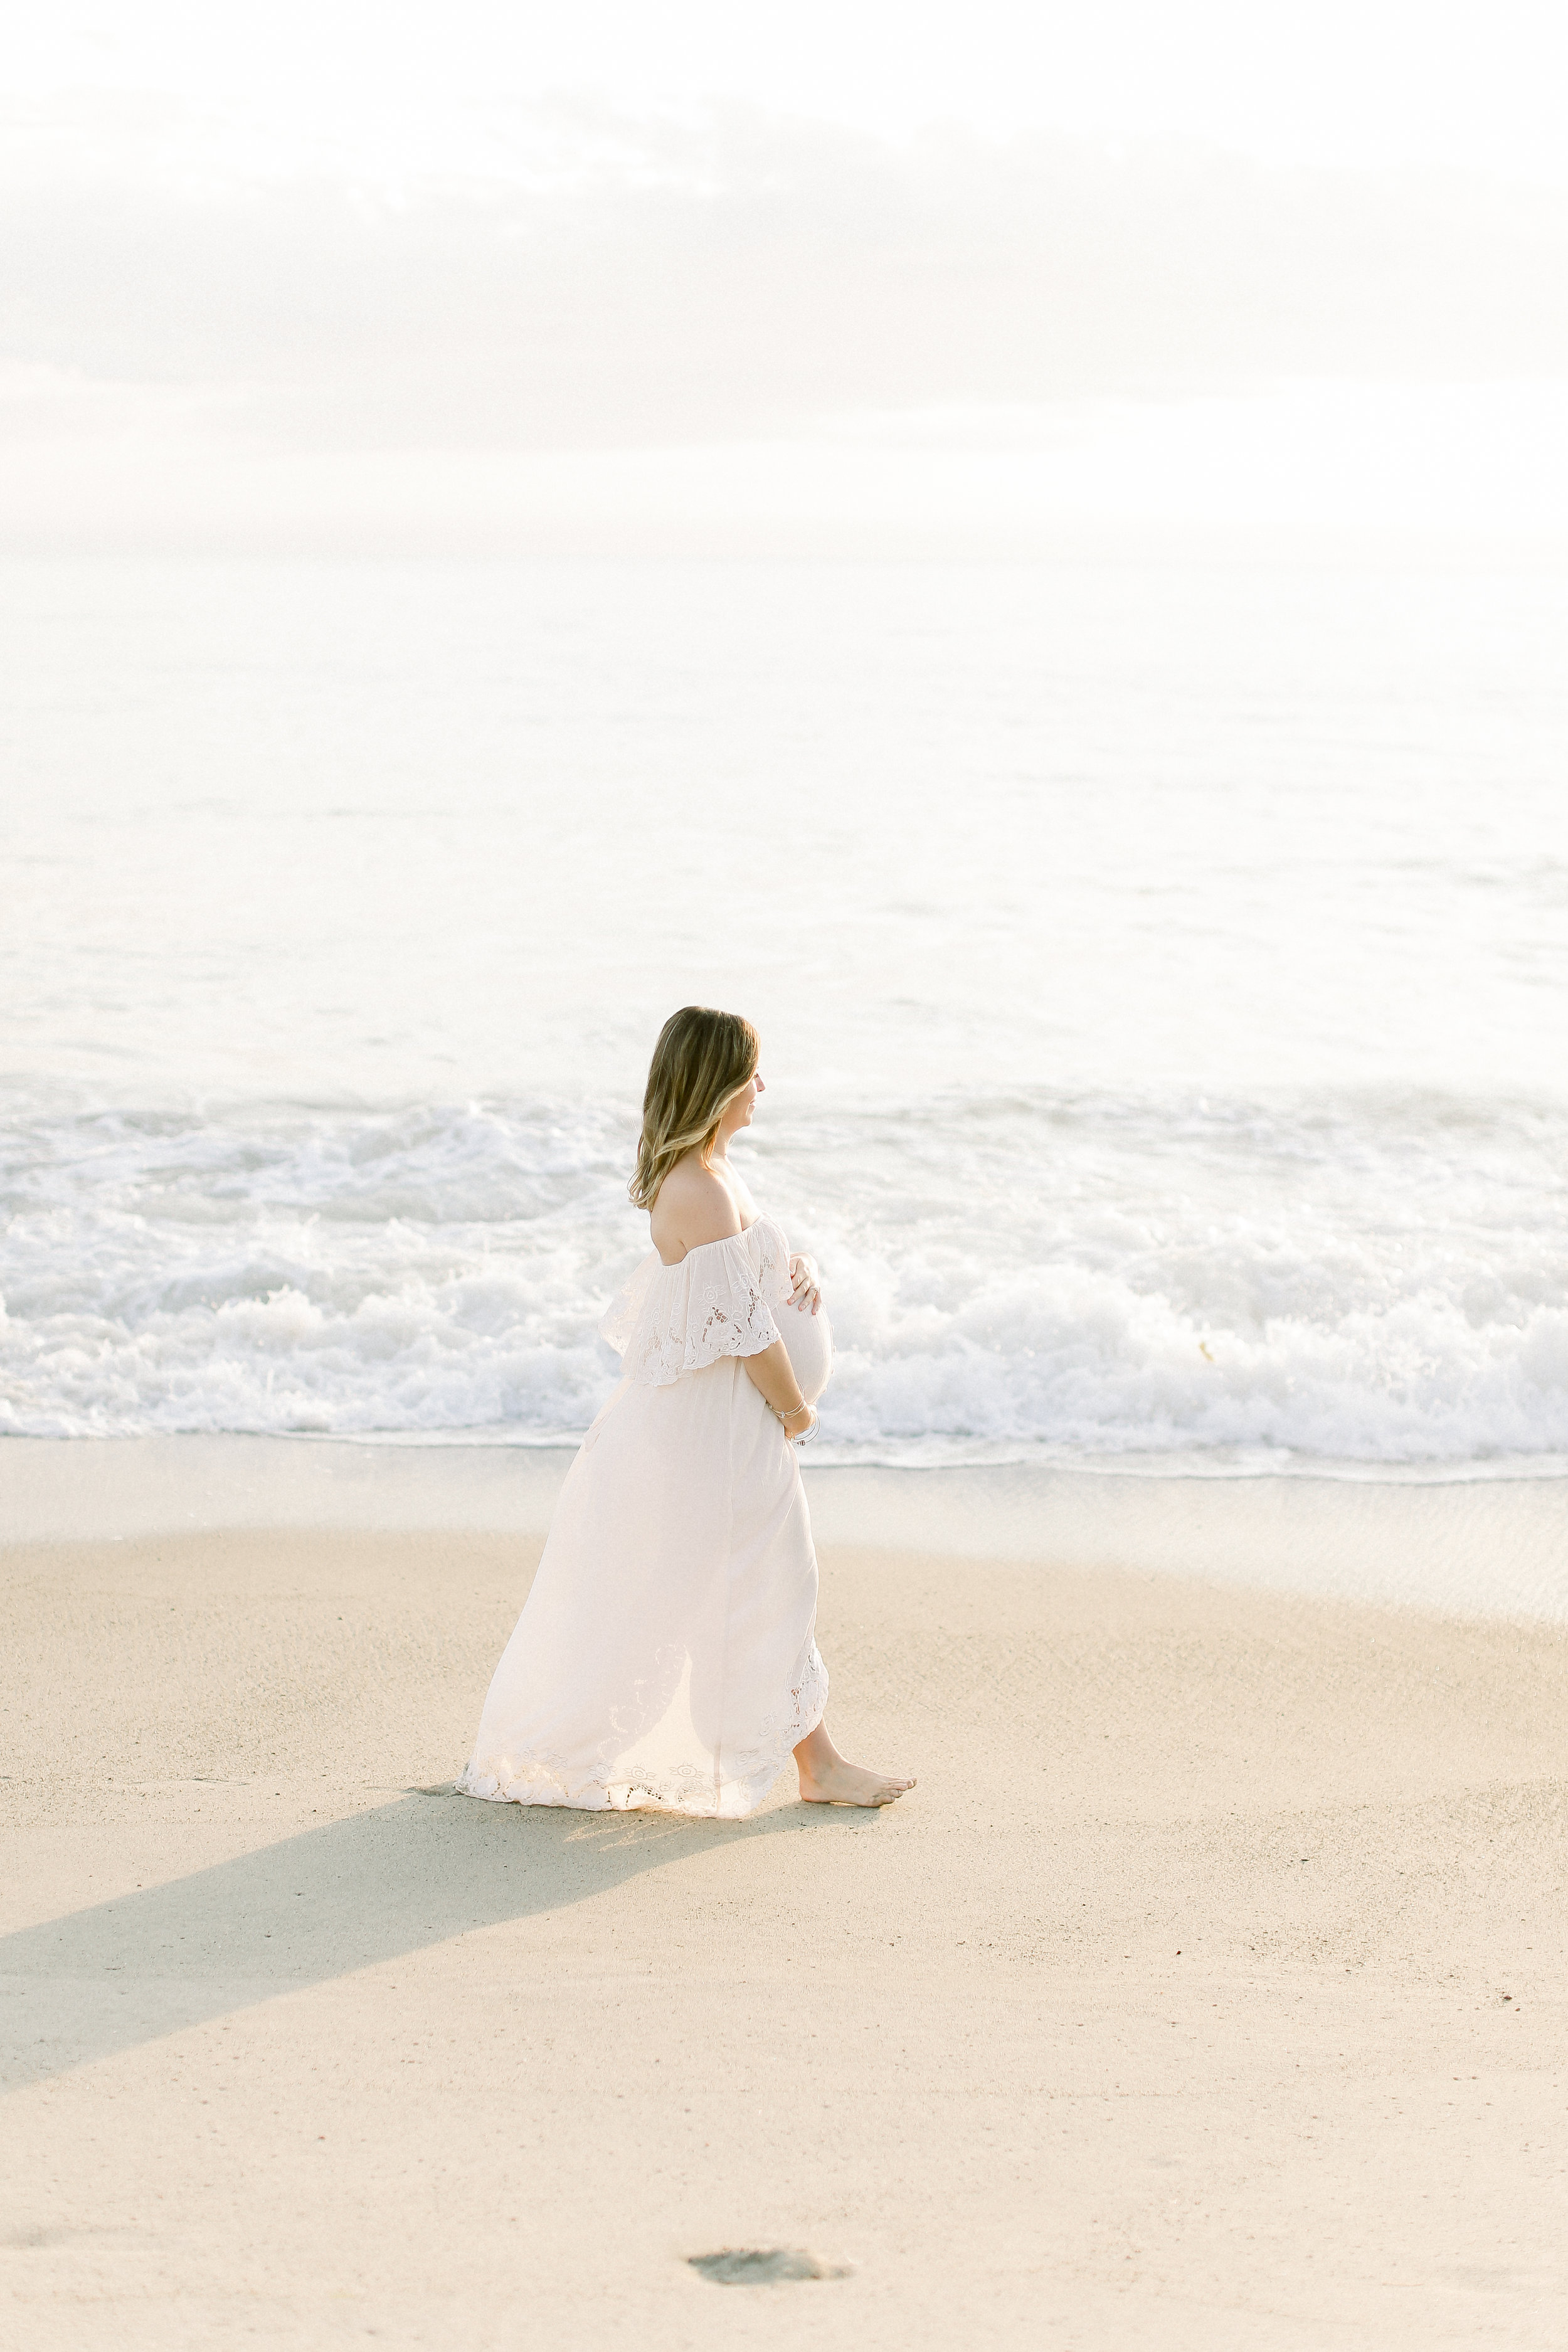 Cori-Kleckner-Photography- Alessia + Jeff Maternity Session1-154.JPG